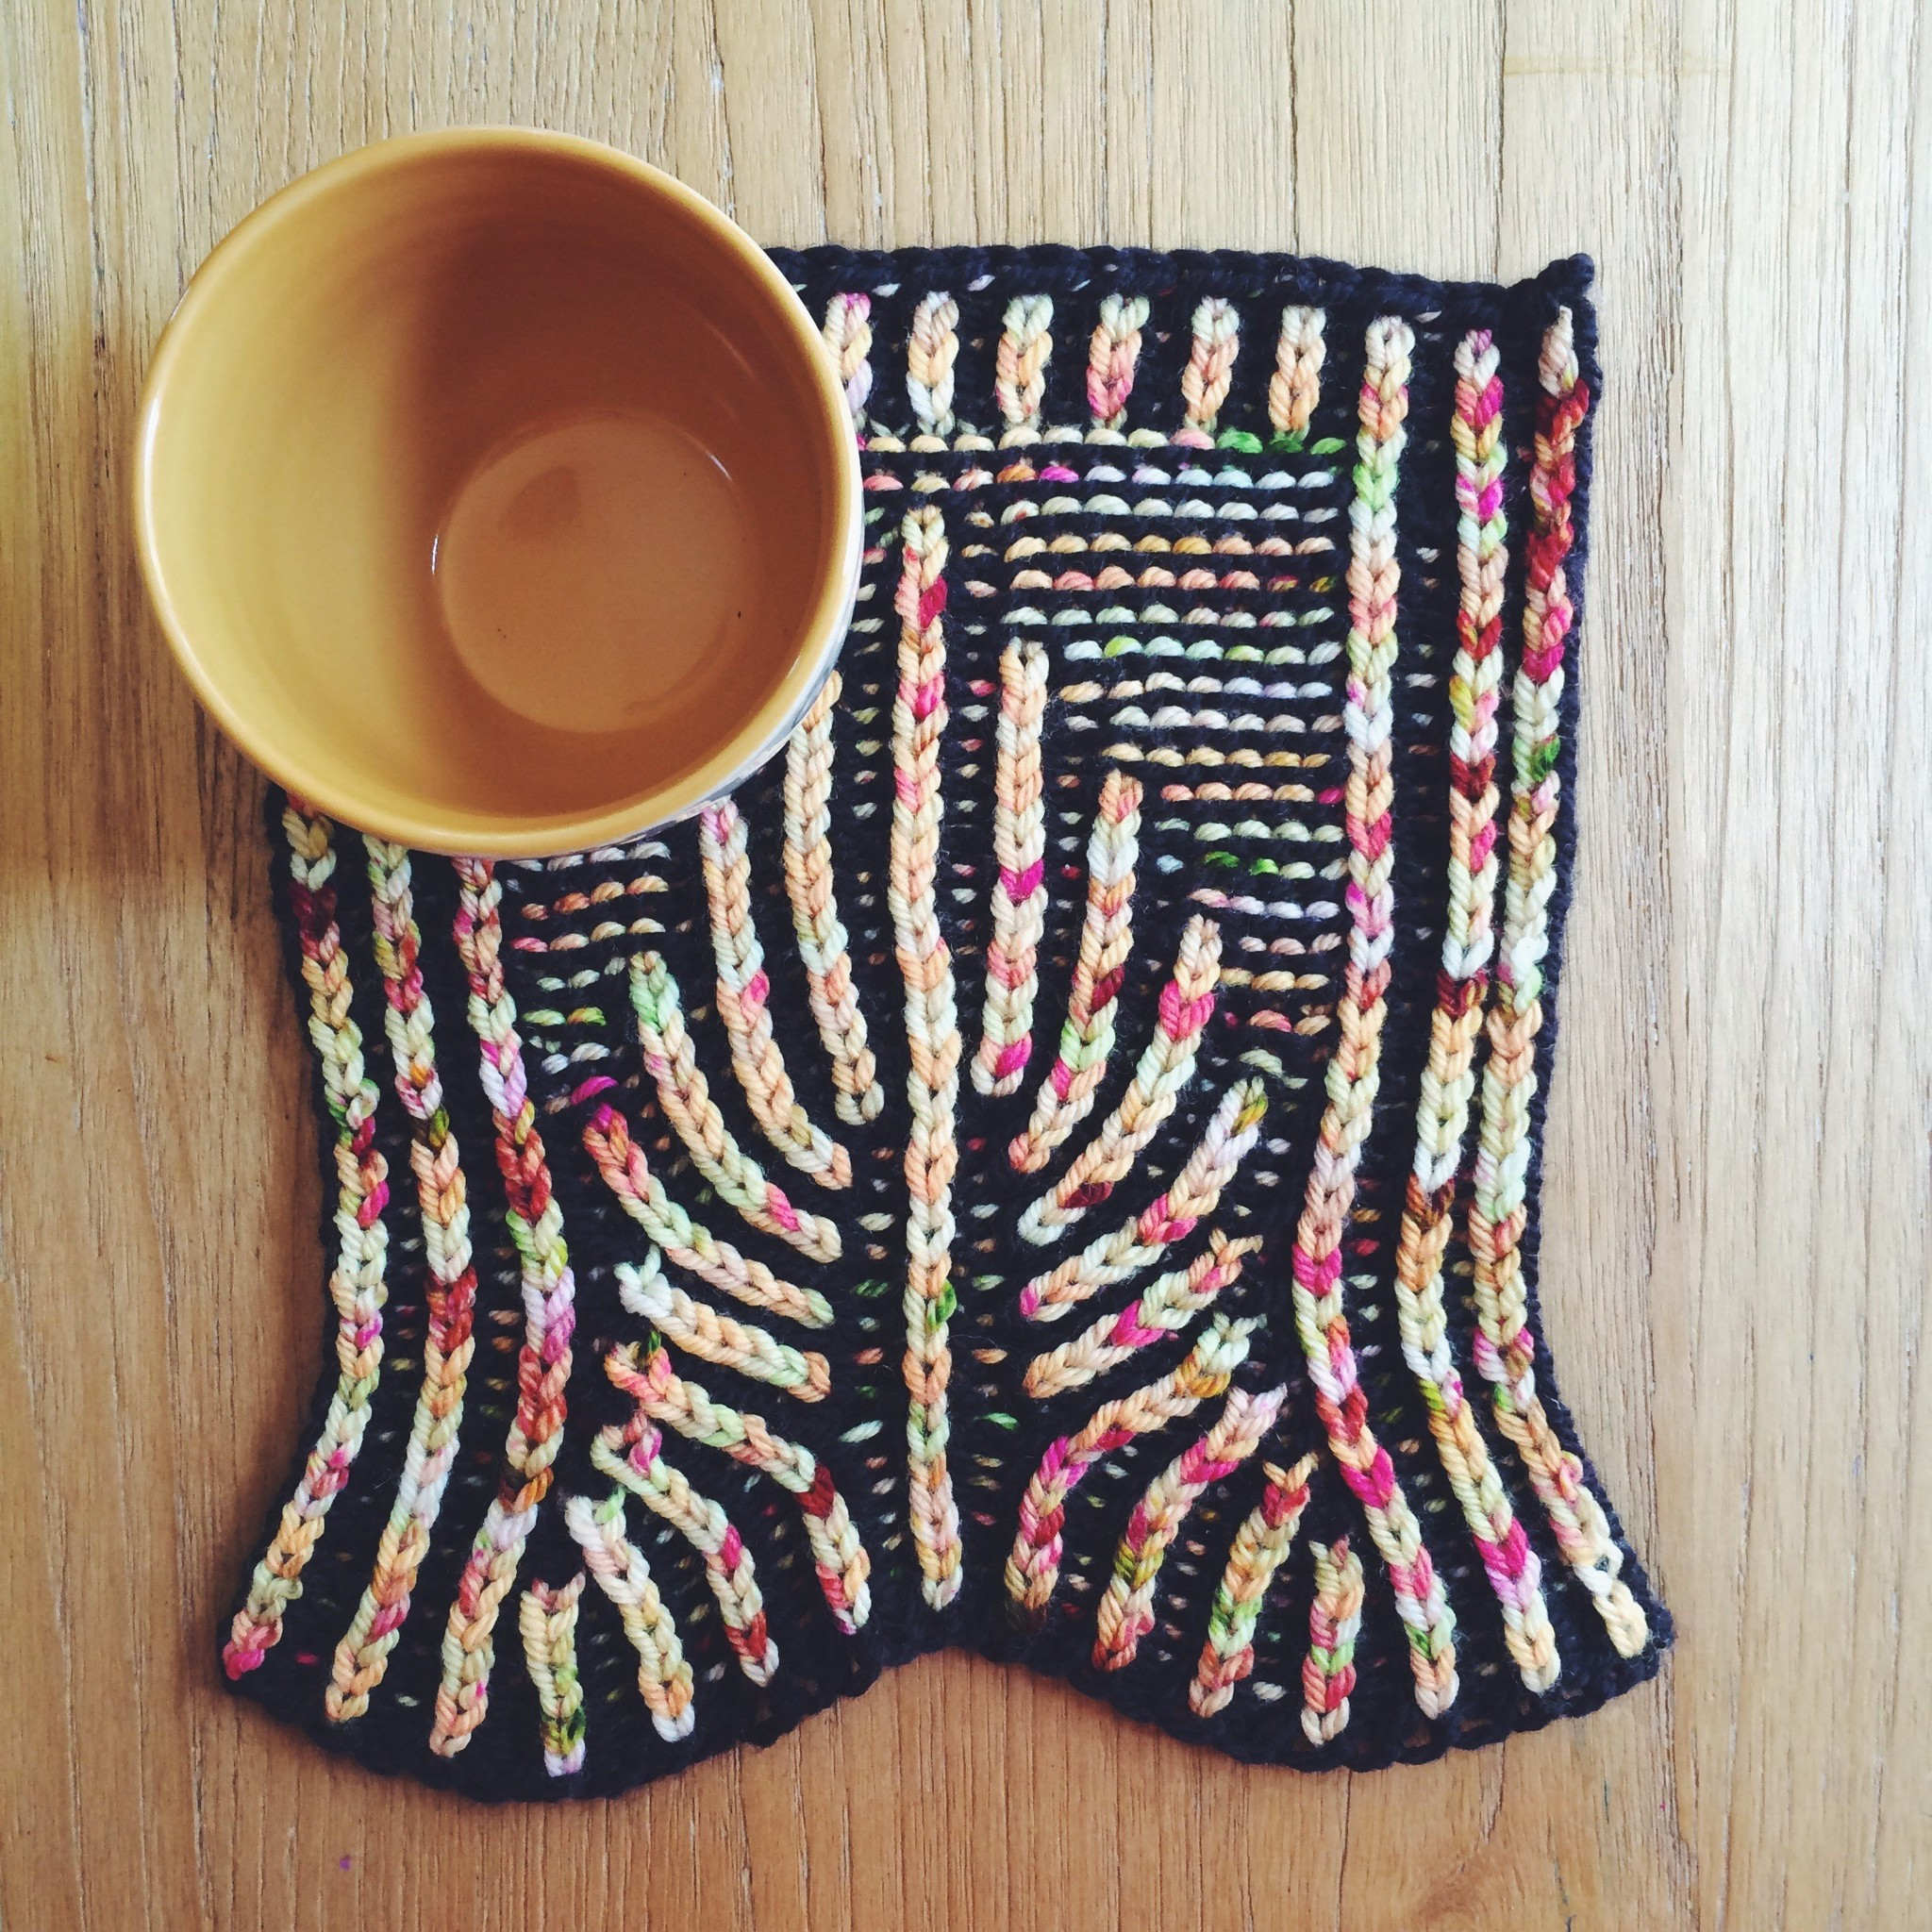 deco mug mat brioche knitting pattern